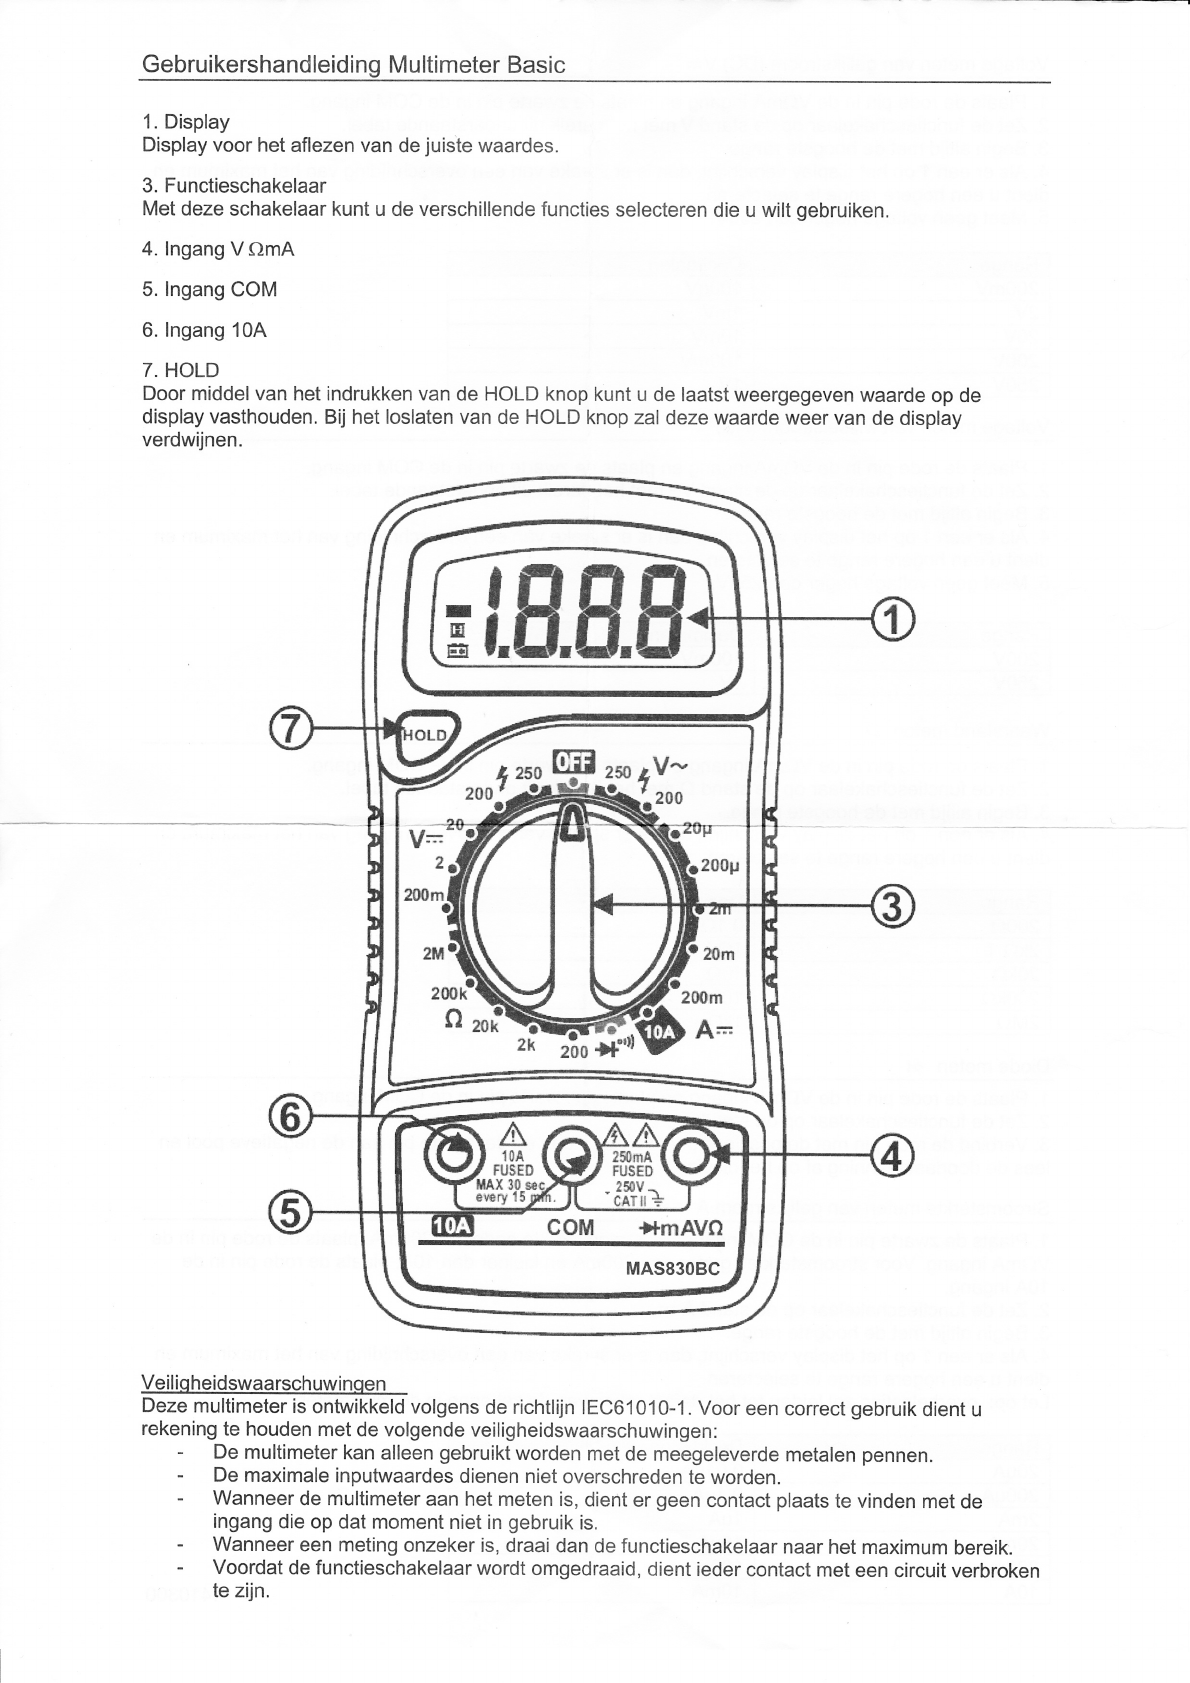 handleiding mastech mas830bc  pagina 1 van 2   nederlands